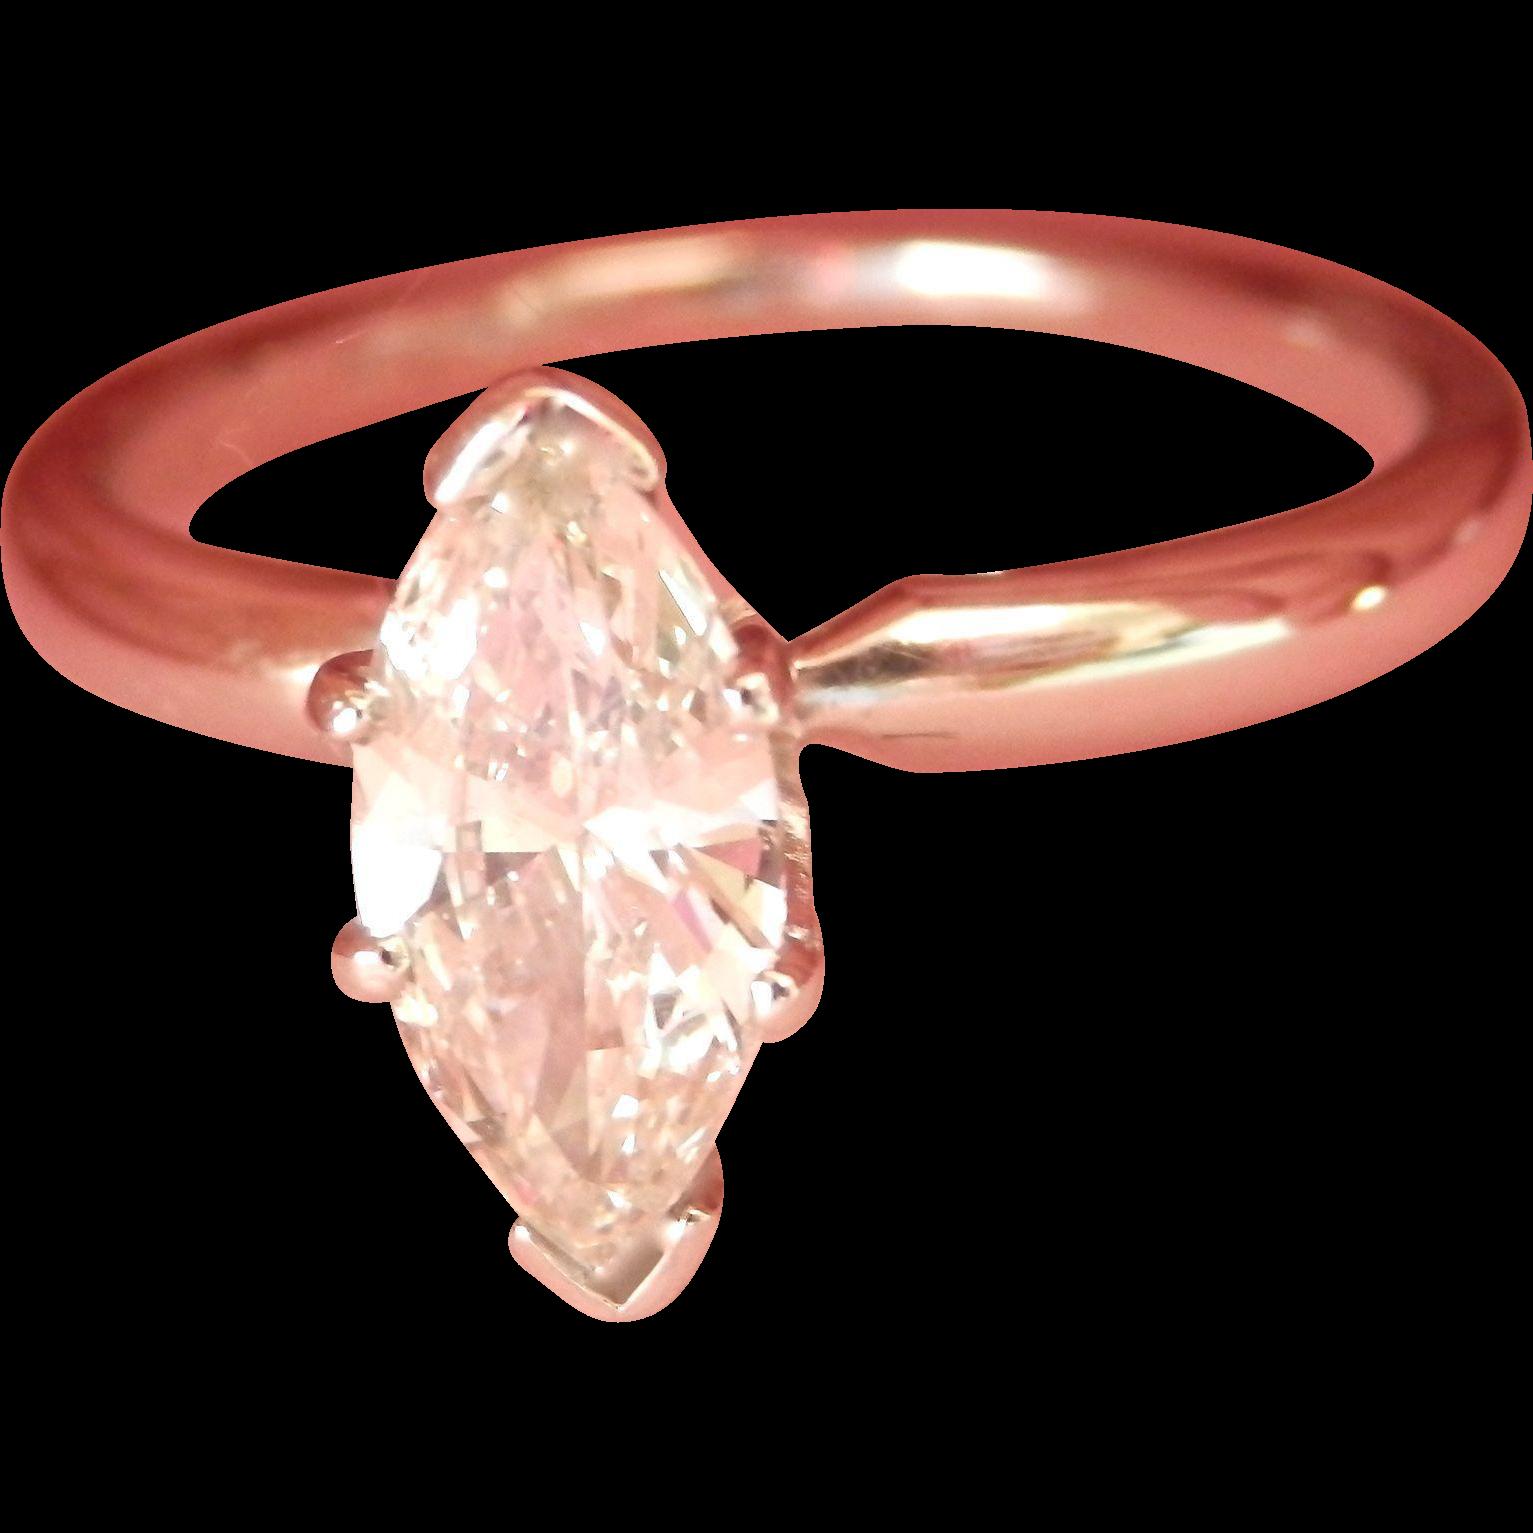 Terrific 14K W/Gold Platinum 0.81 ct. VS Diamond Solitaire Ring